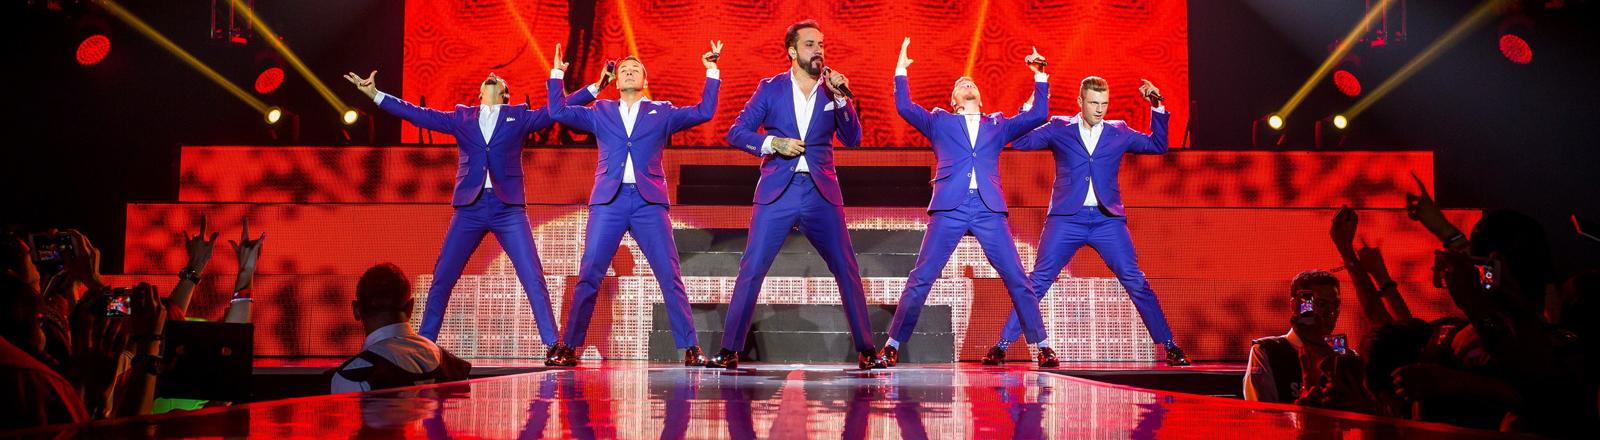 Revival der Backstreet Boys, Konzert in Macau, China